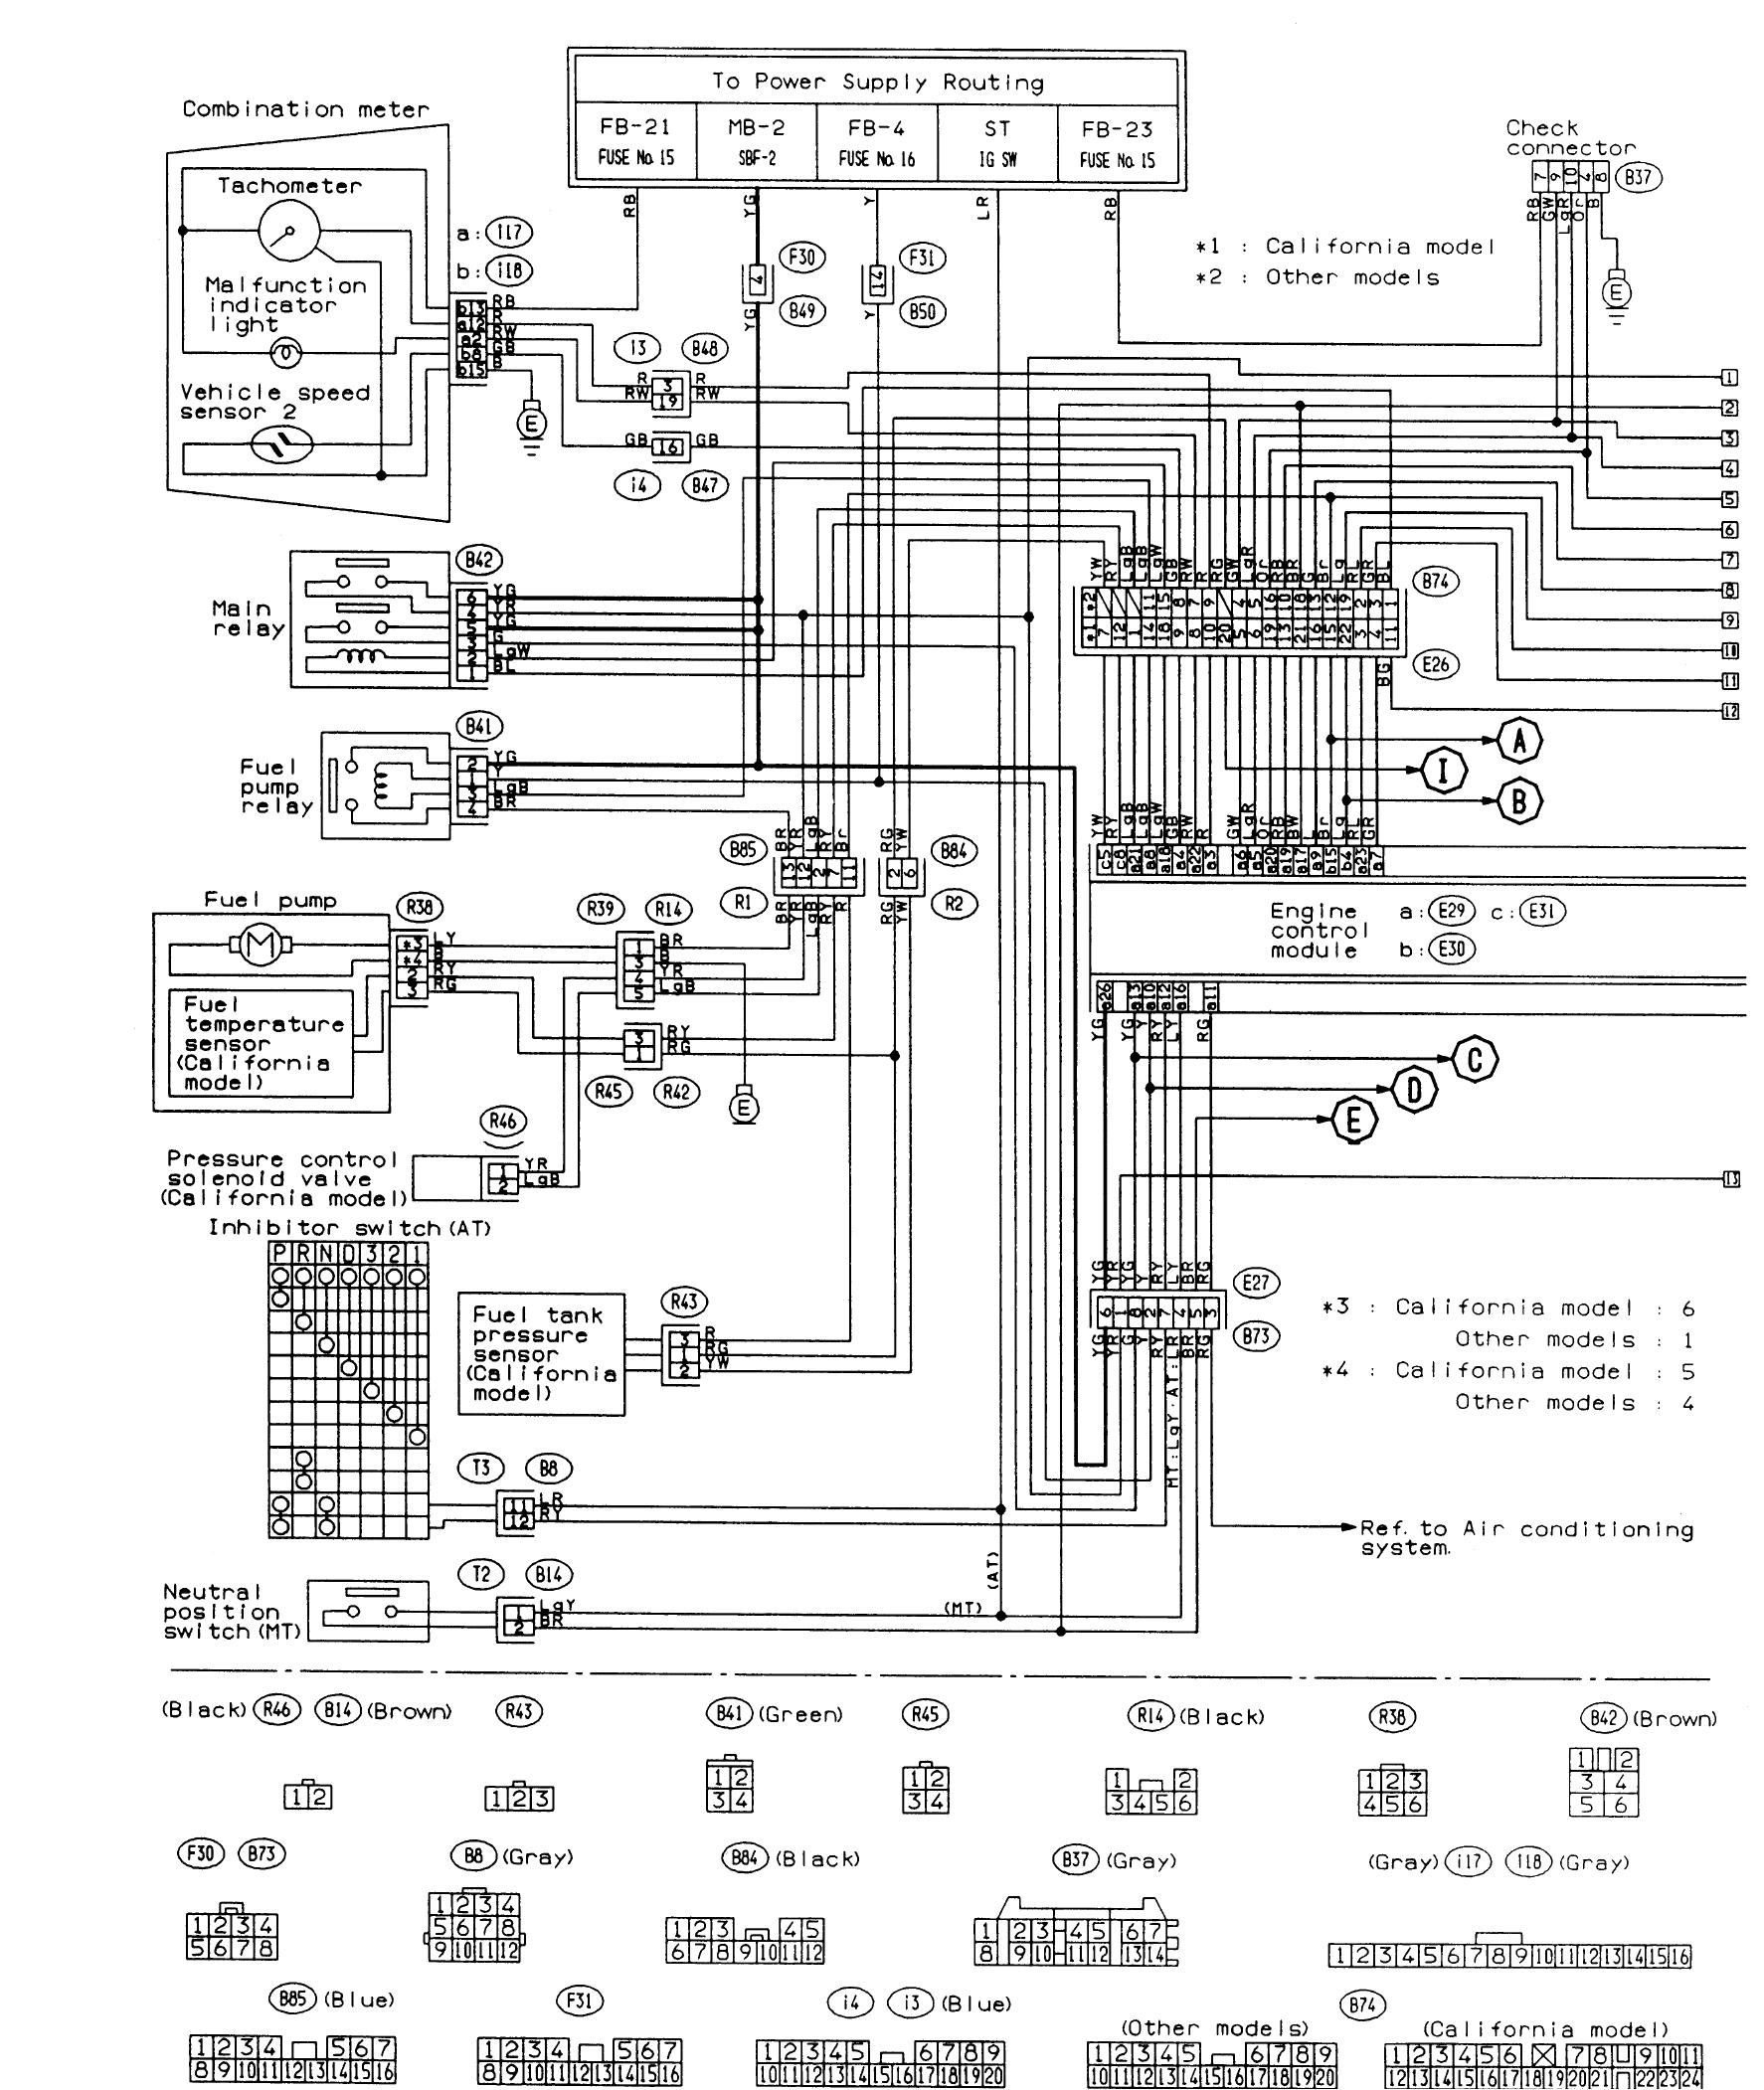 1998 Subaru forester Wiring Diagram Subaru Trailer Wiring Diagram Wiring Diagram Name